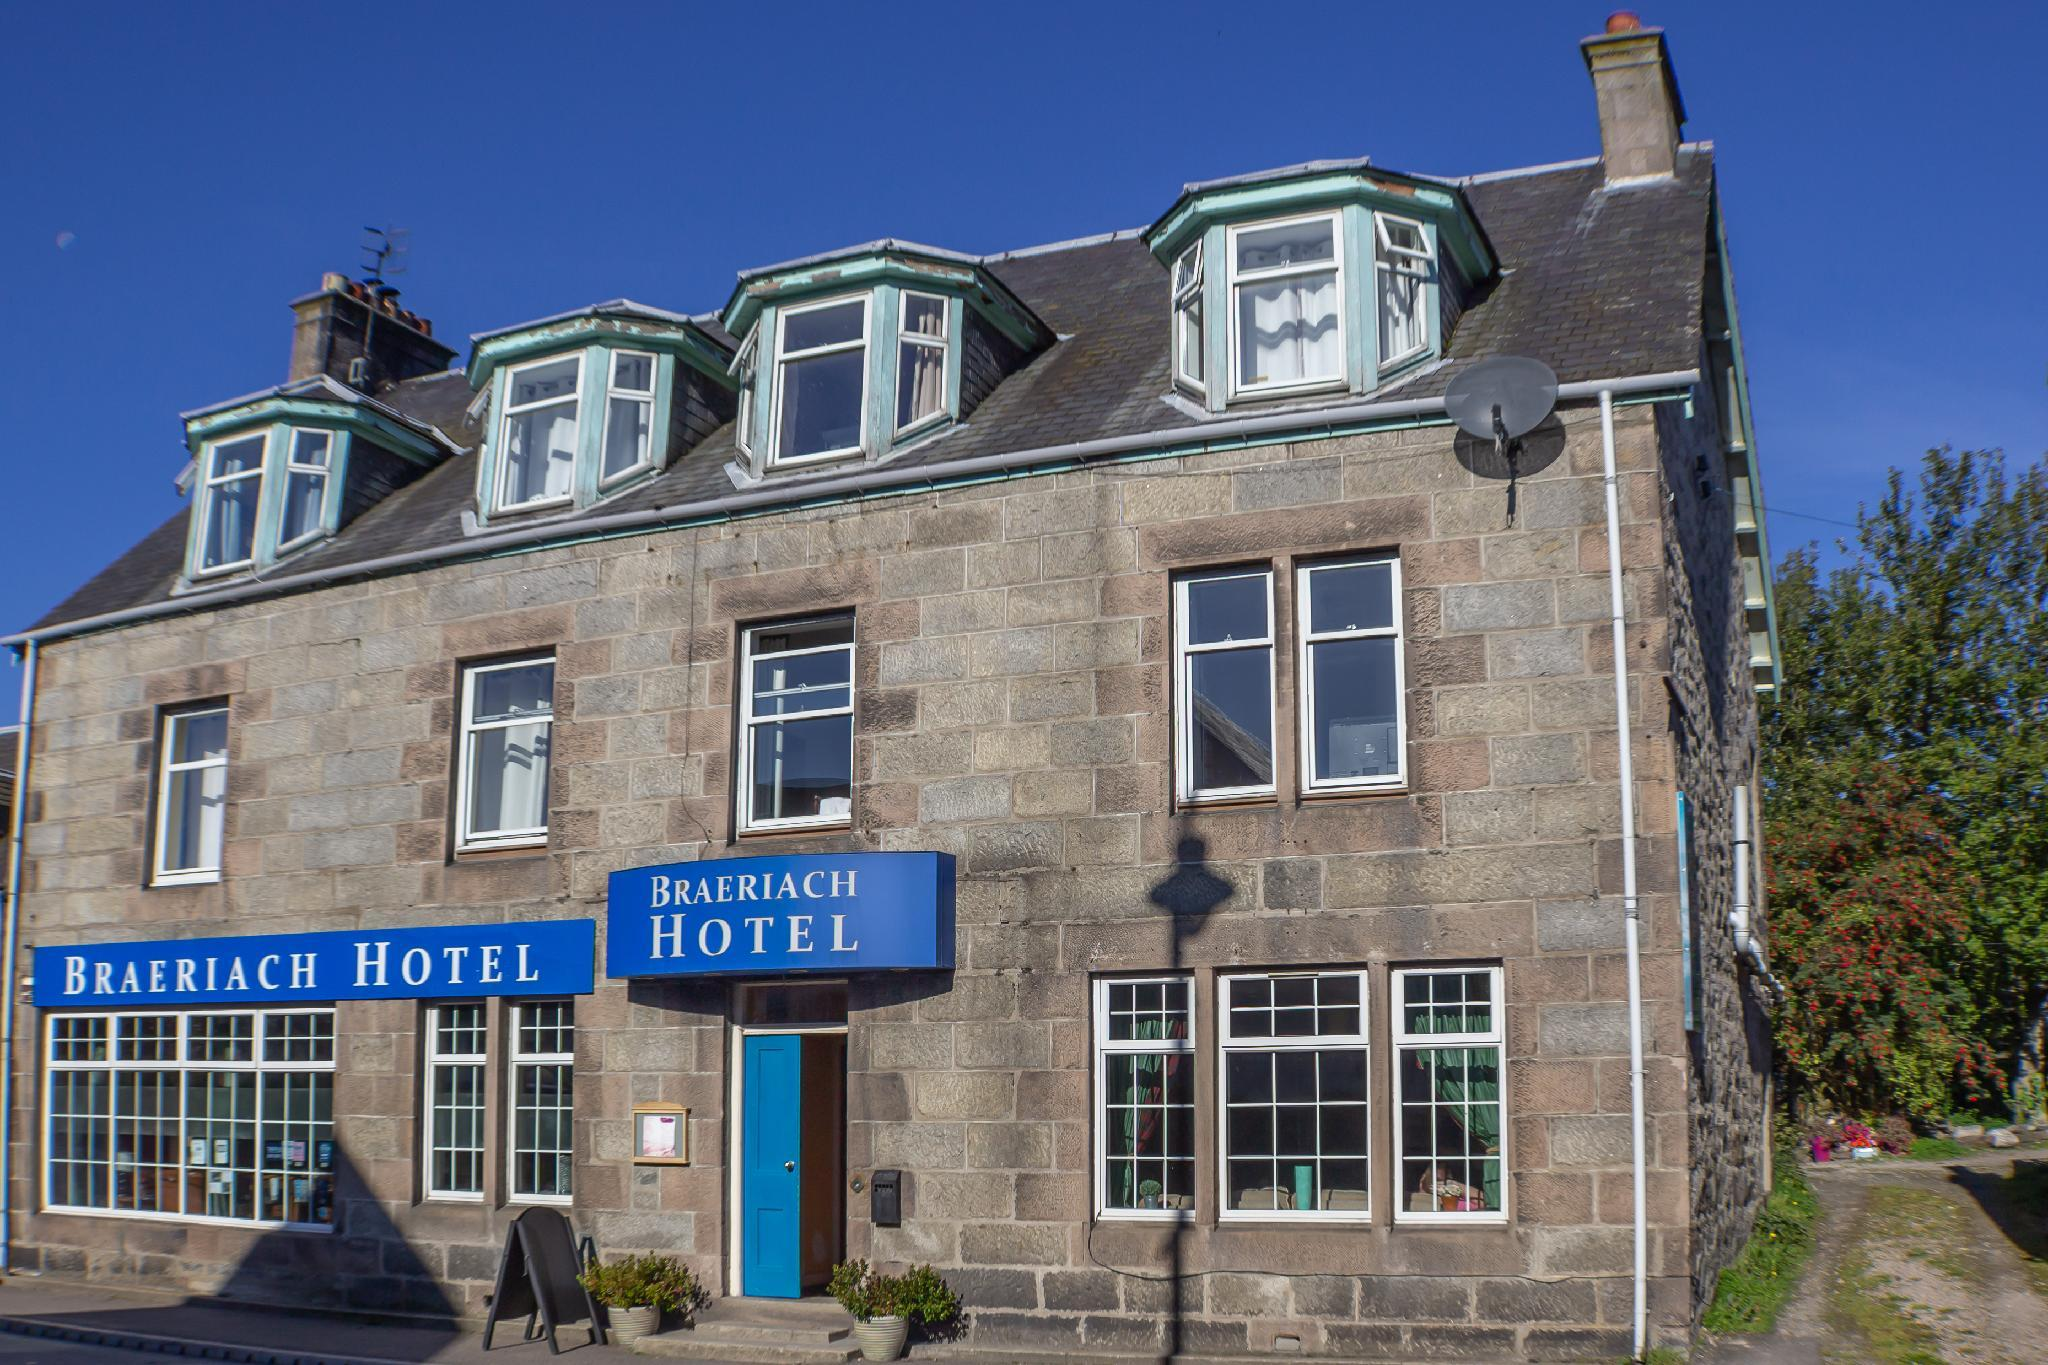 Braeriach Hotel